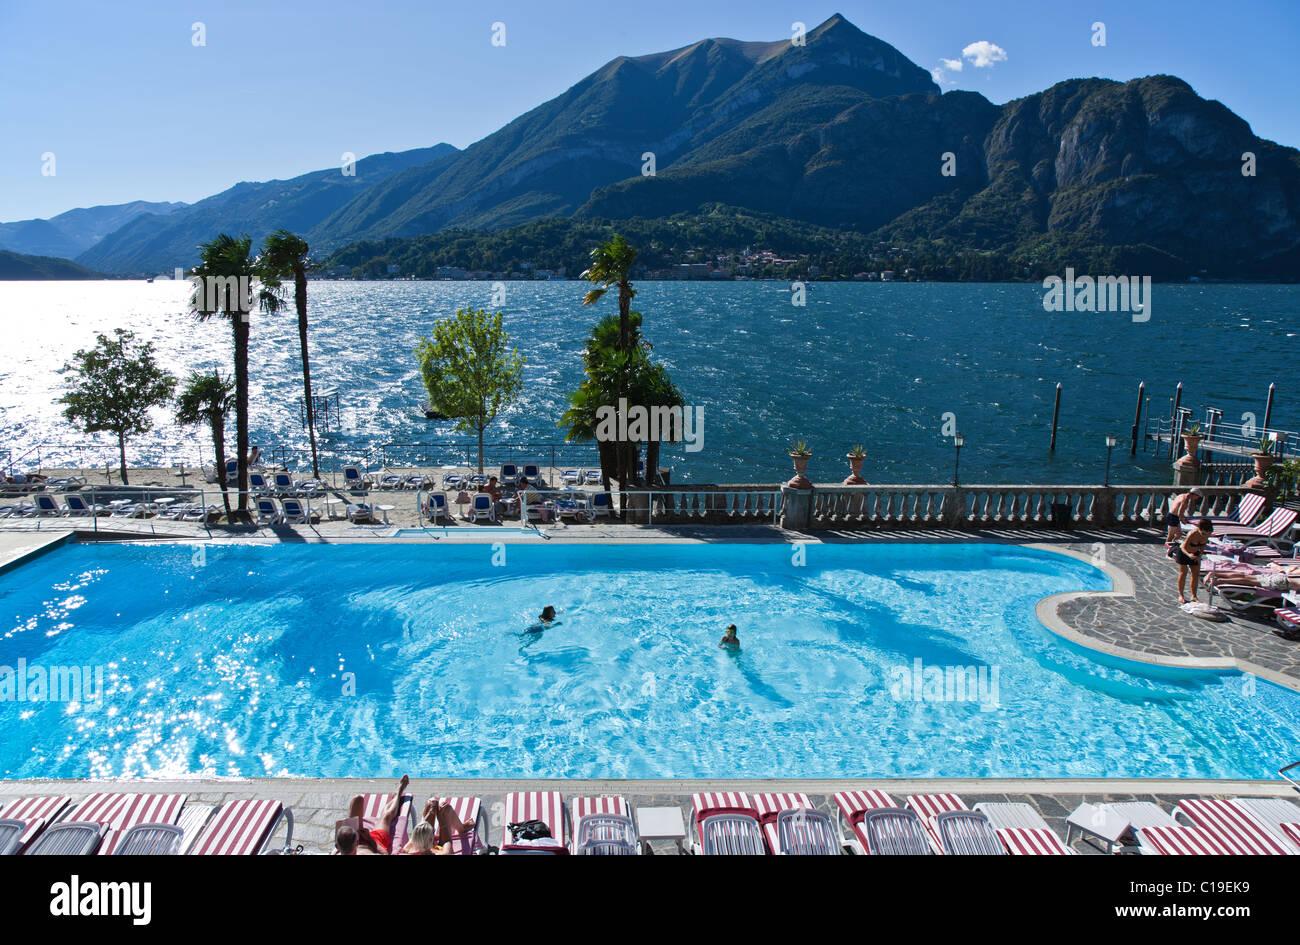 Italy Como Lake A Bellagio 39 S Hotel Swimming Pool Stock Photo Royalty Free Image 35244477 Alamy